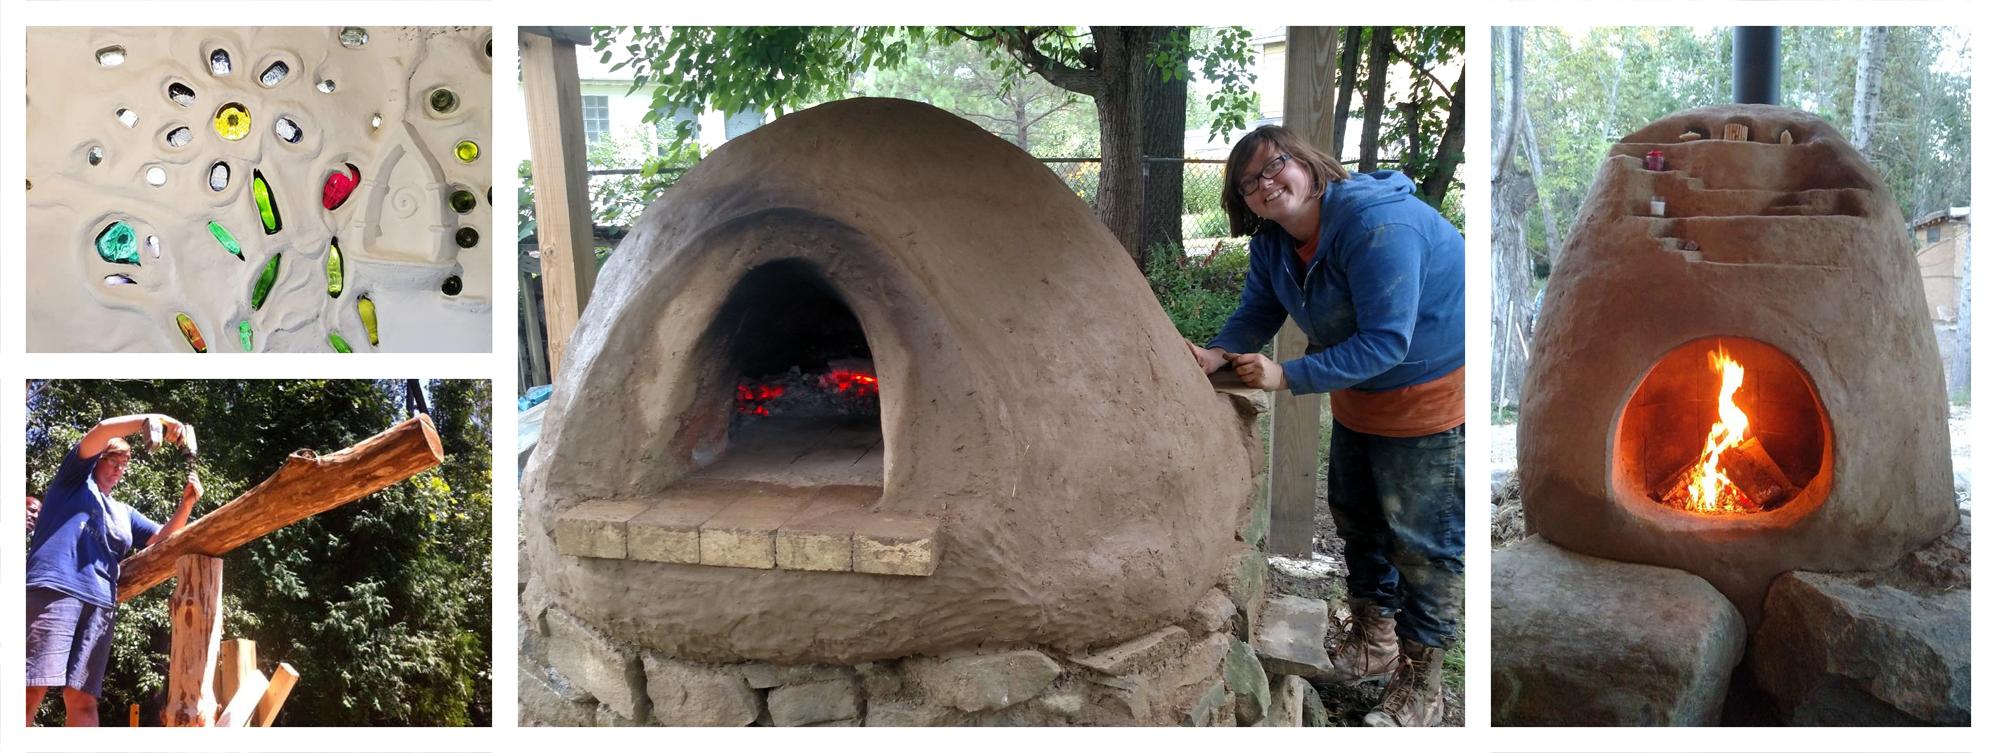 Christiana's rocket oven, cob oven, cob and glass wall